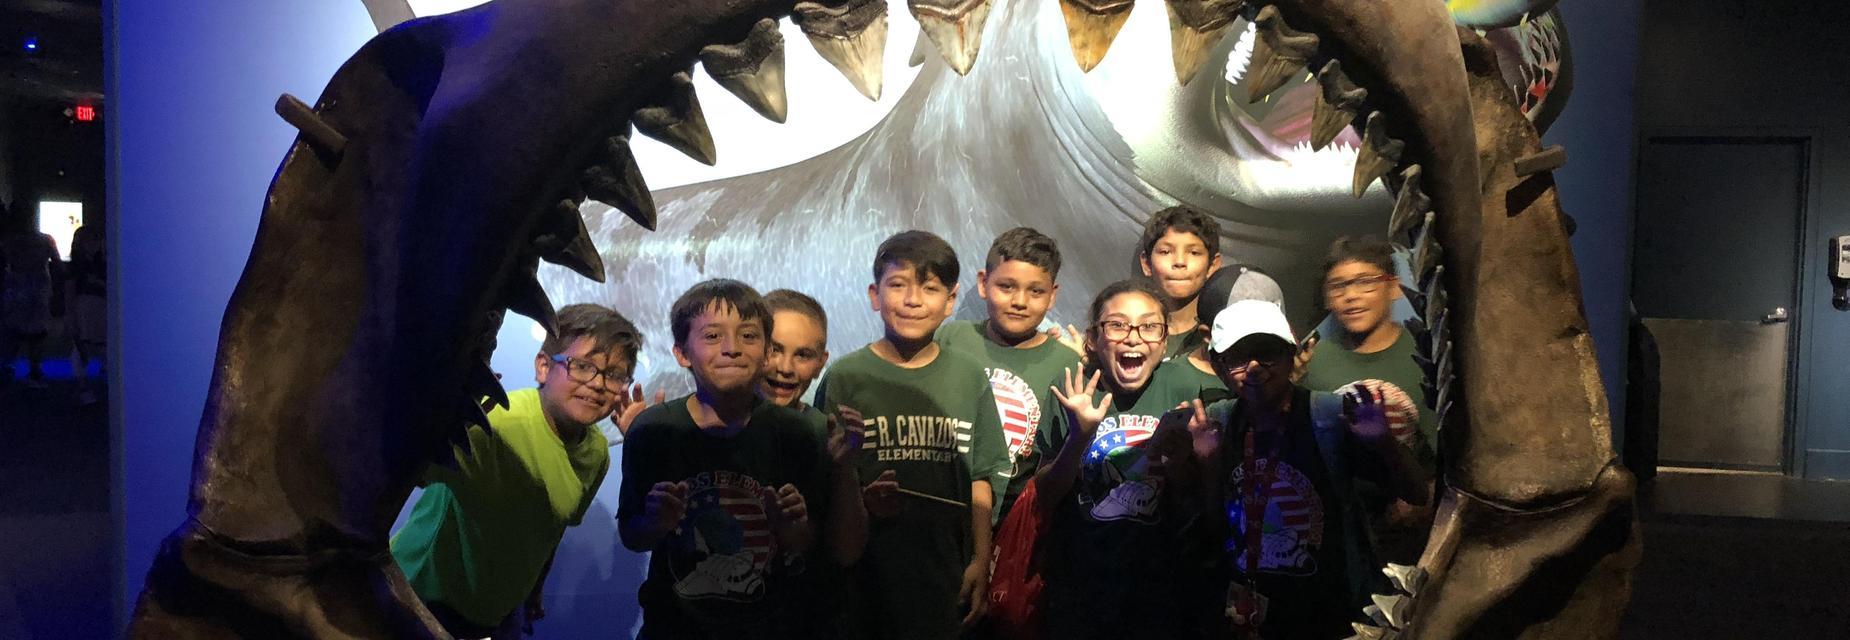 students inside of shark mouth skeleton